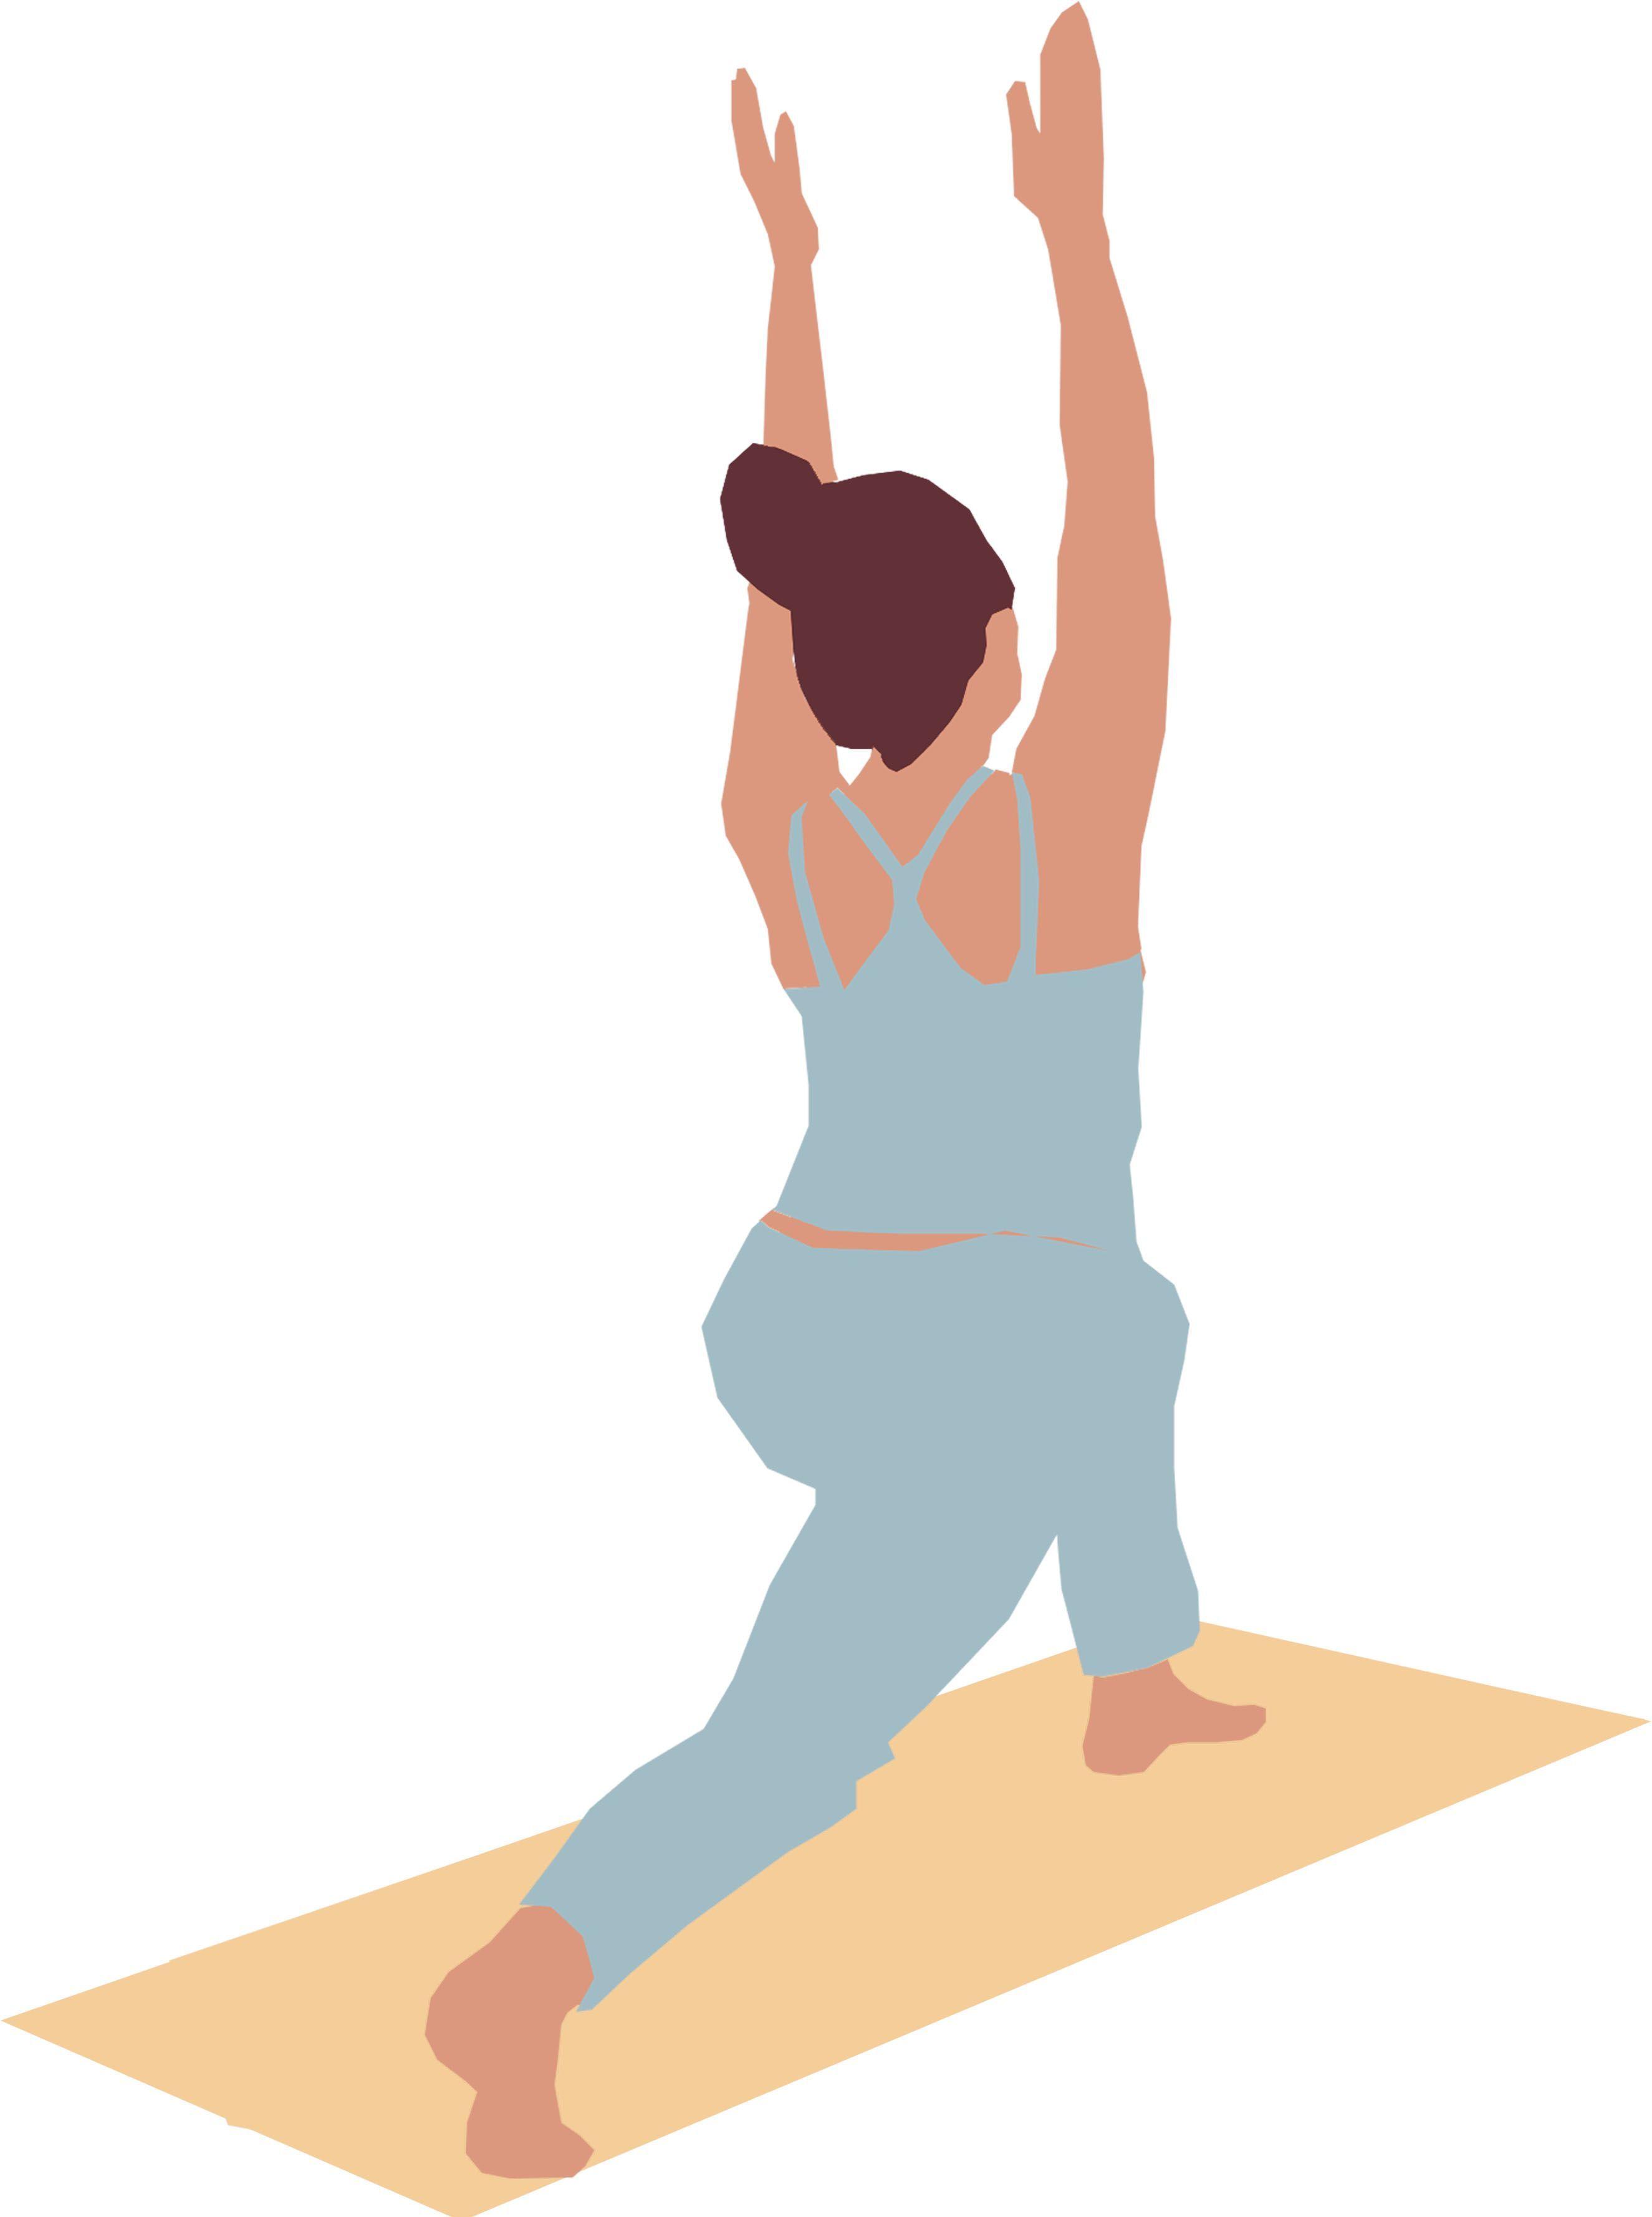 Flat People Woman Yoga In 2020 People Png Woman Yoga Yoga Illustration